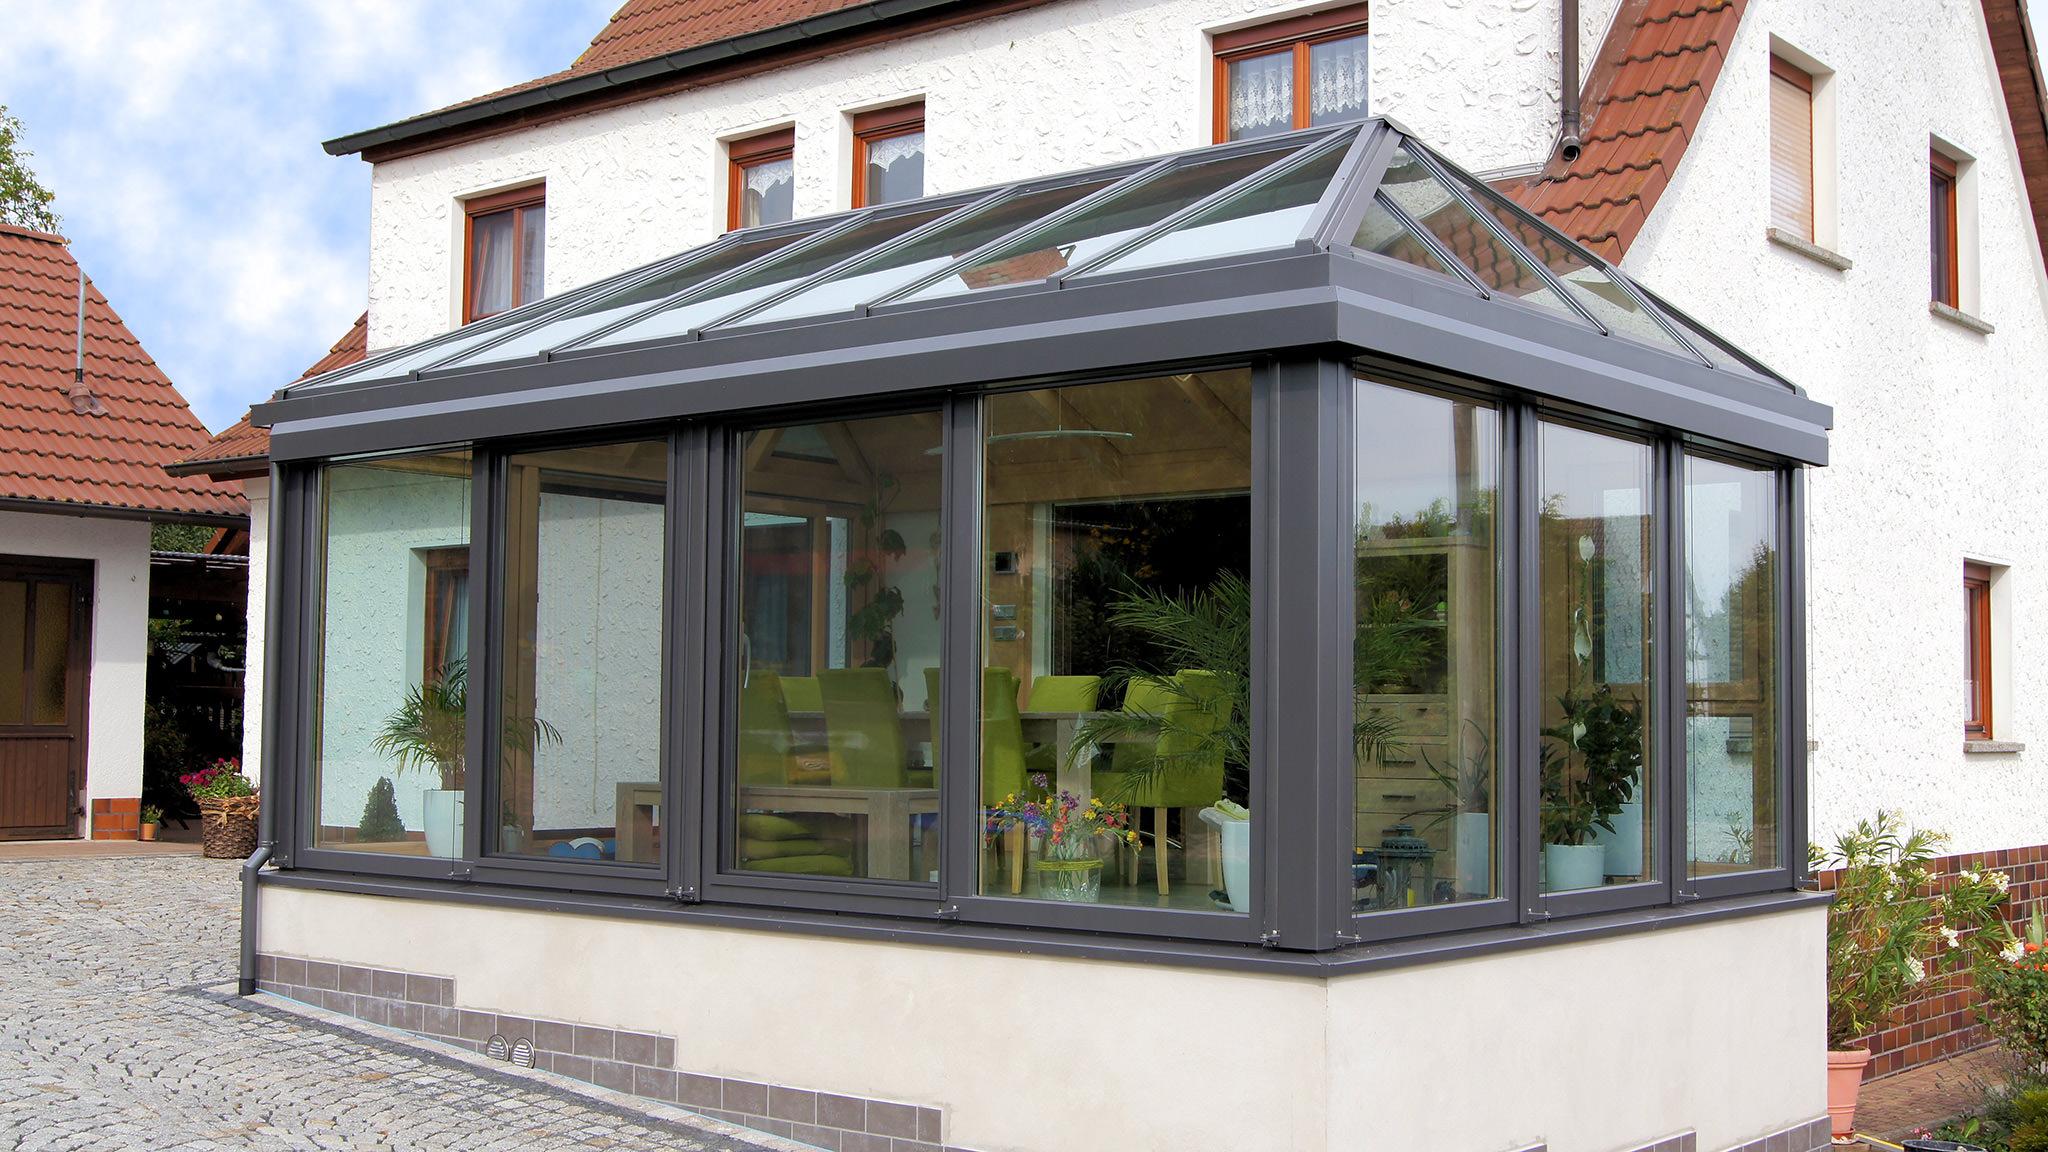 moderner wintergarten krenzer wintergarten ratgeber. Black Bedroom Furniture Sets. Home Design Ideas